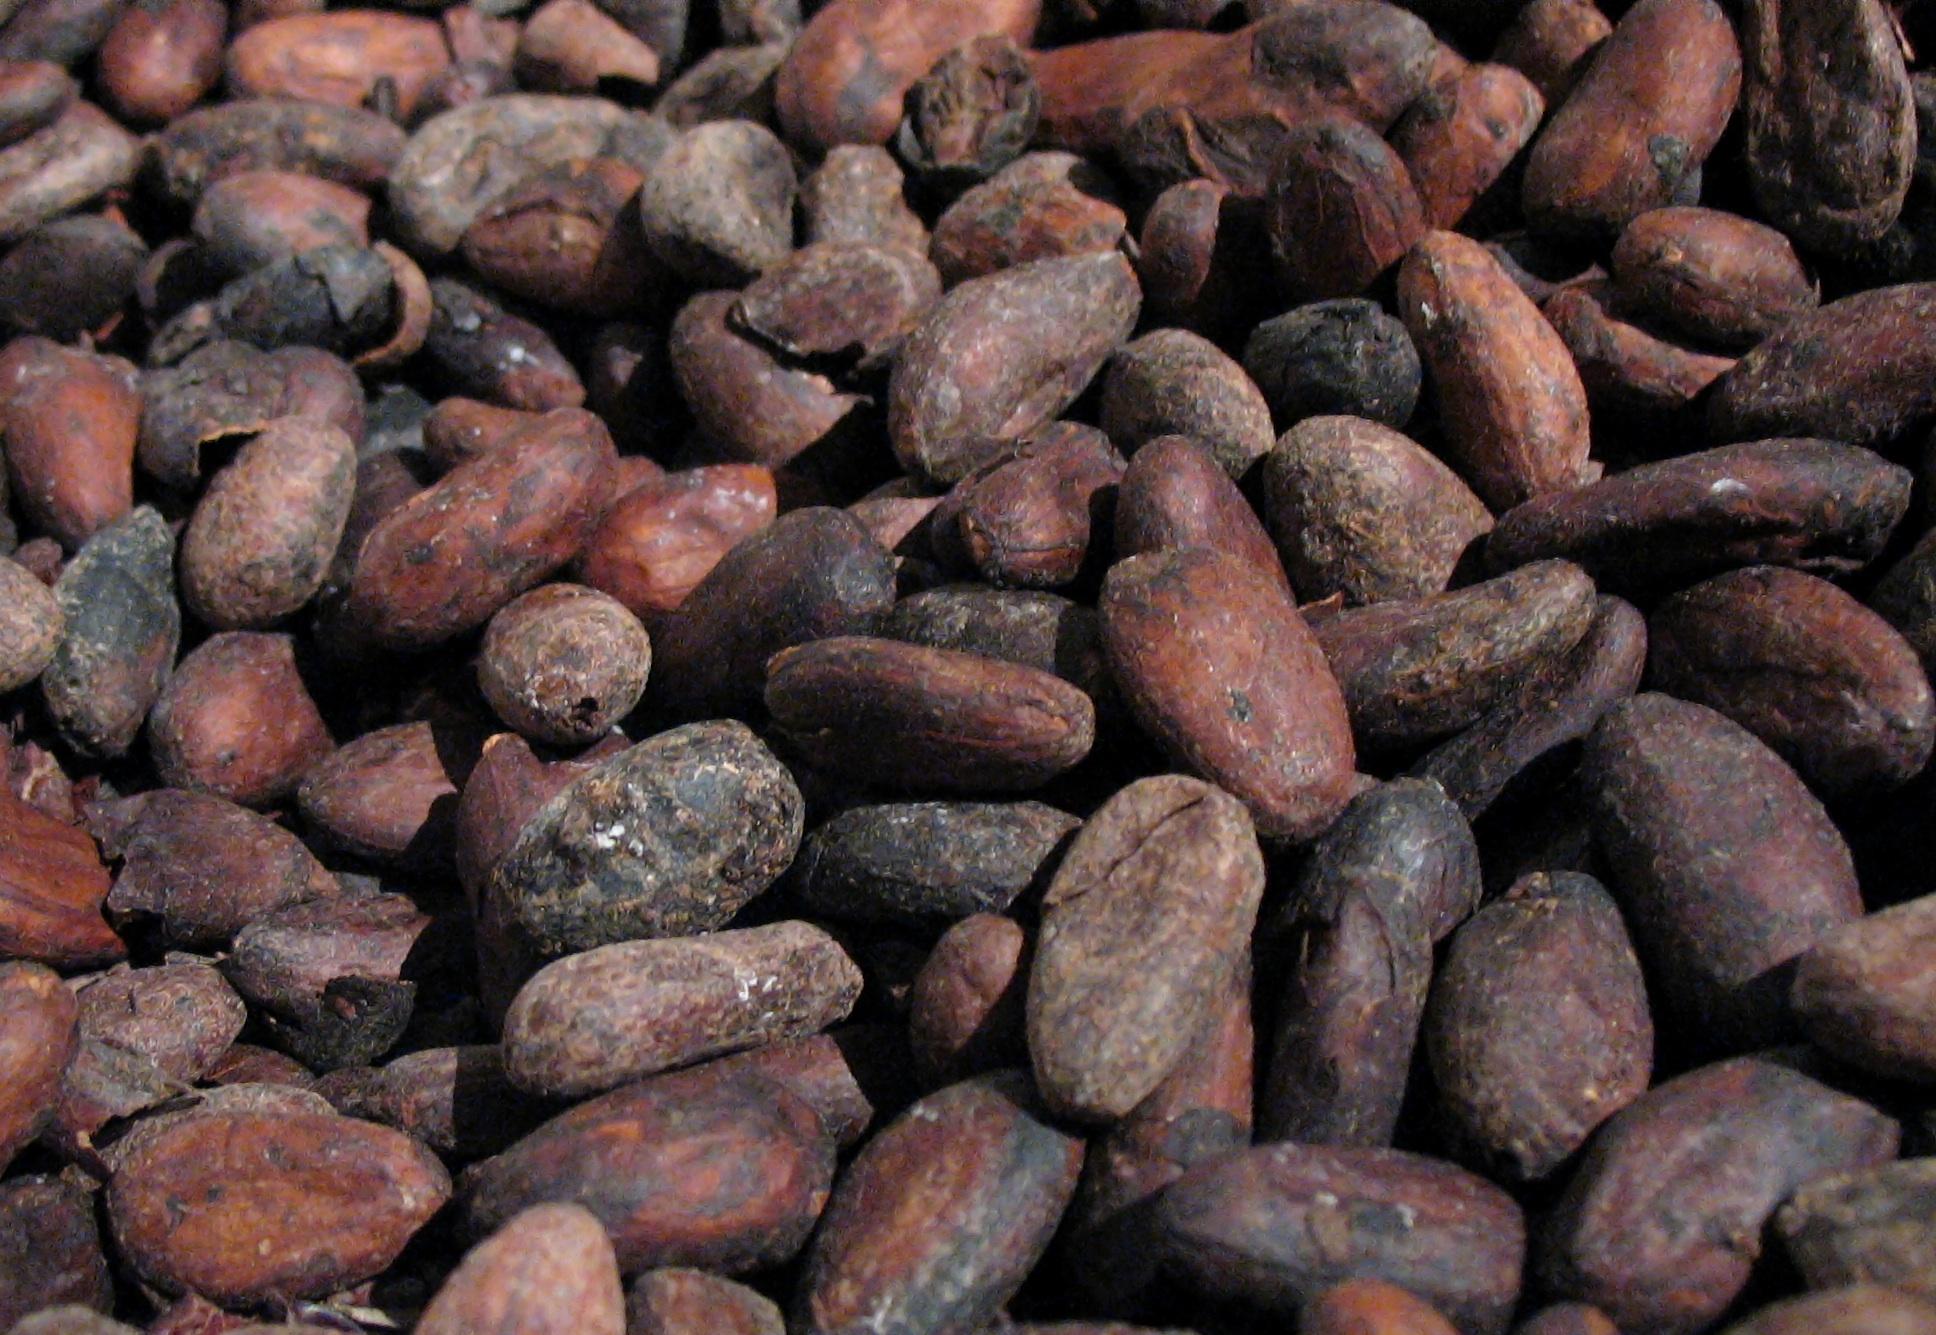 Exportan cacao colombiano a Inglaterra